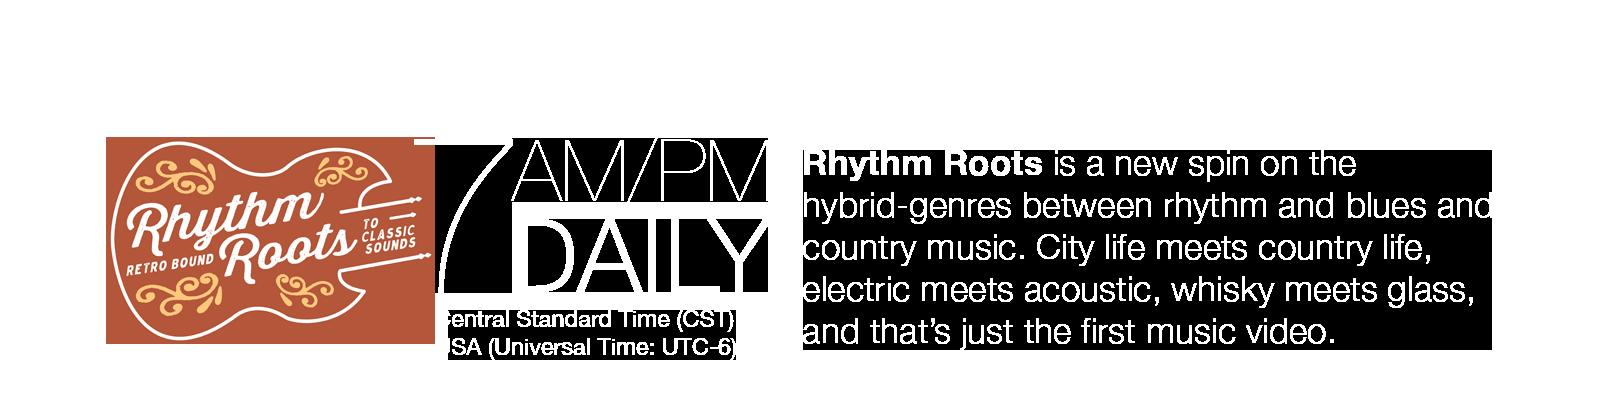 HomePageSlide-RythmRoots7-new